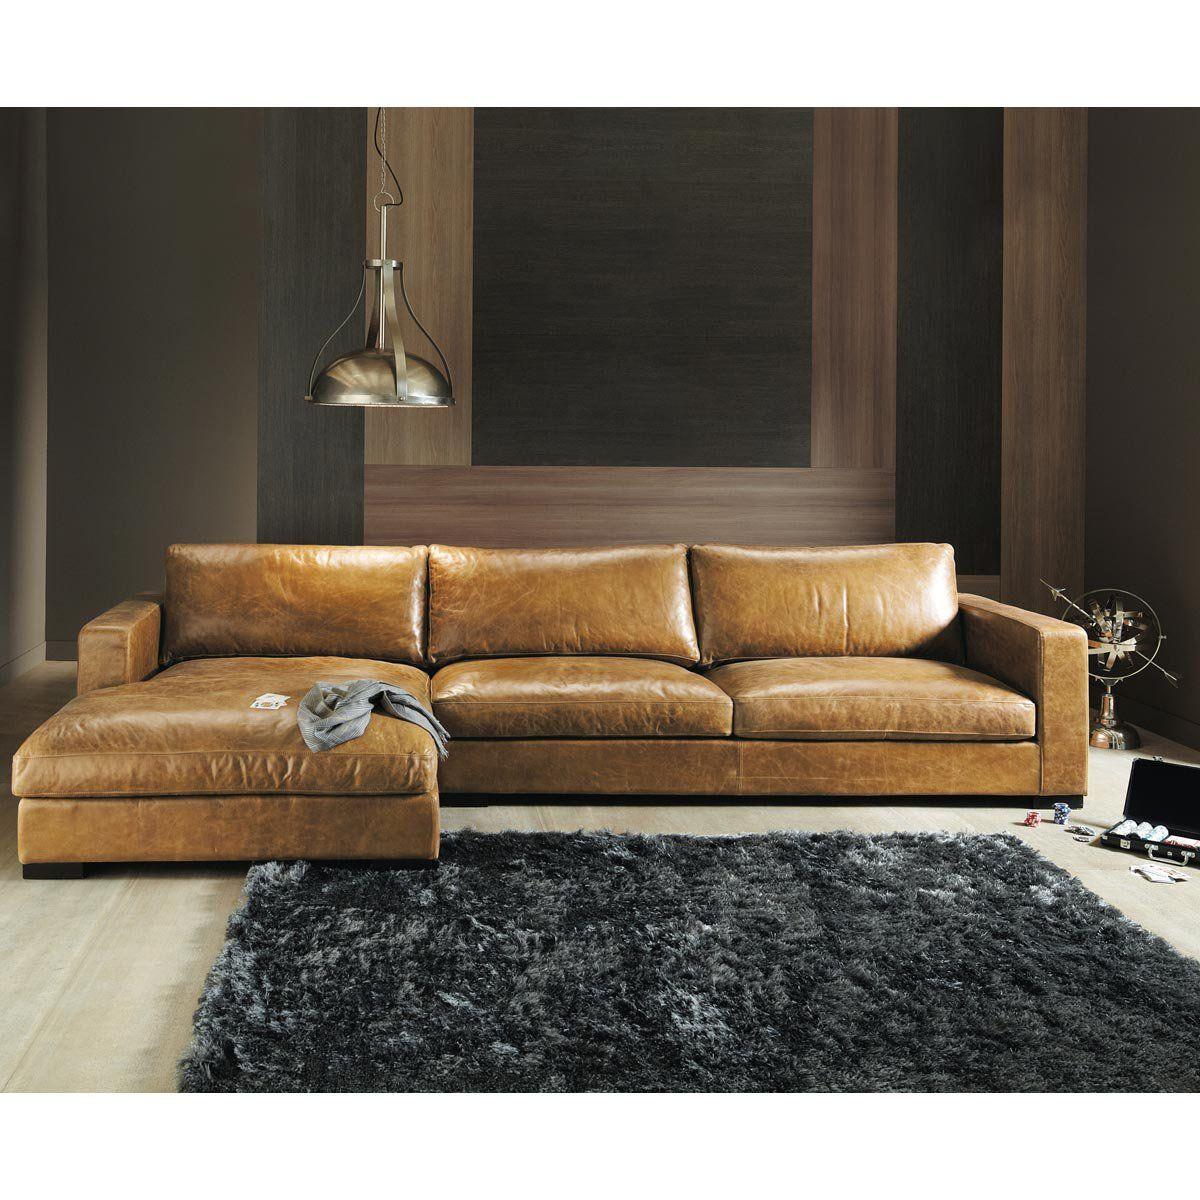 Corner Sofas   Left and Right Corner Sofas   Leather ...